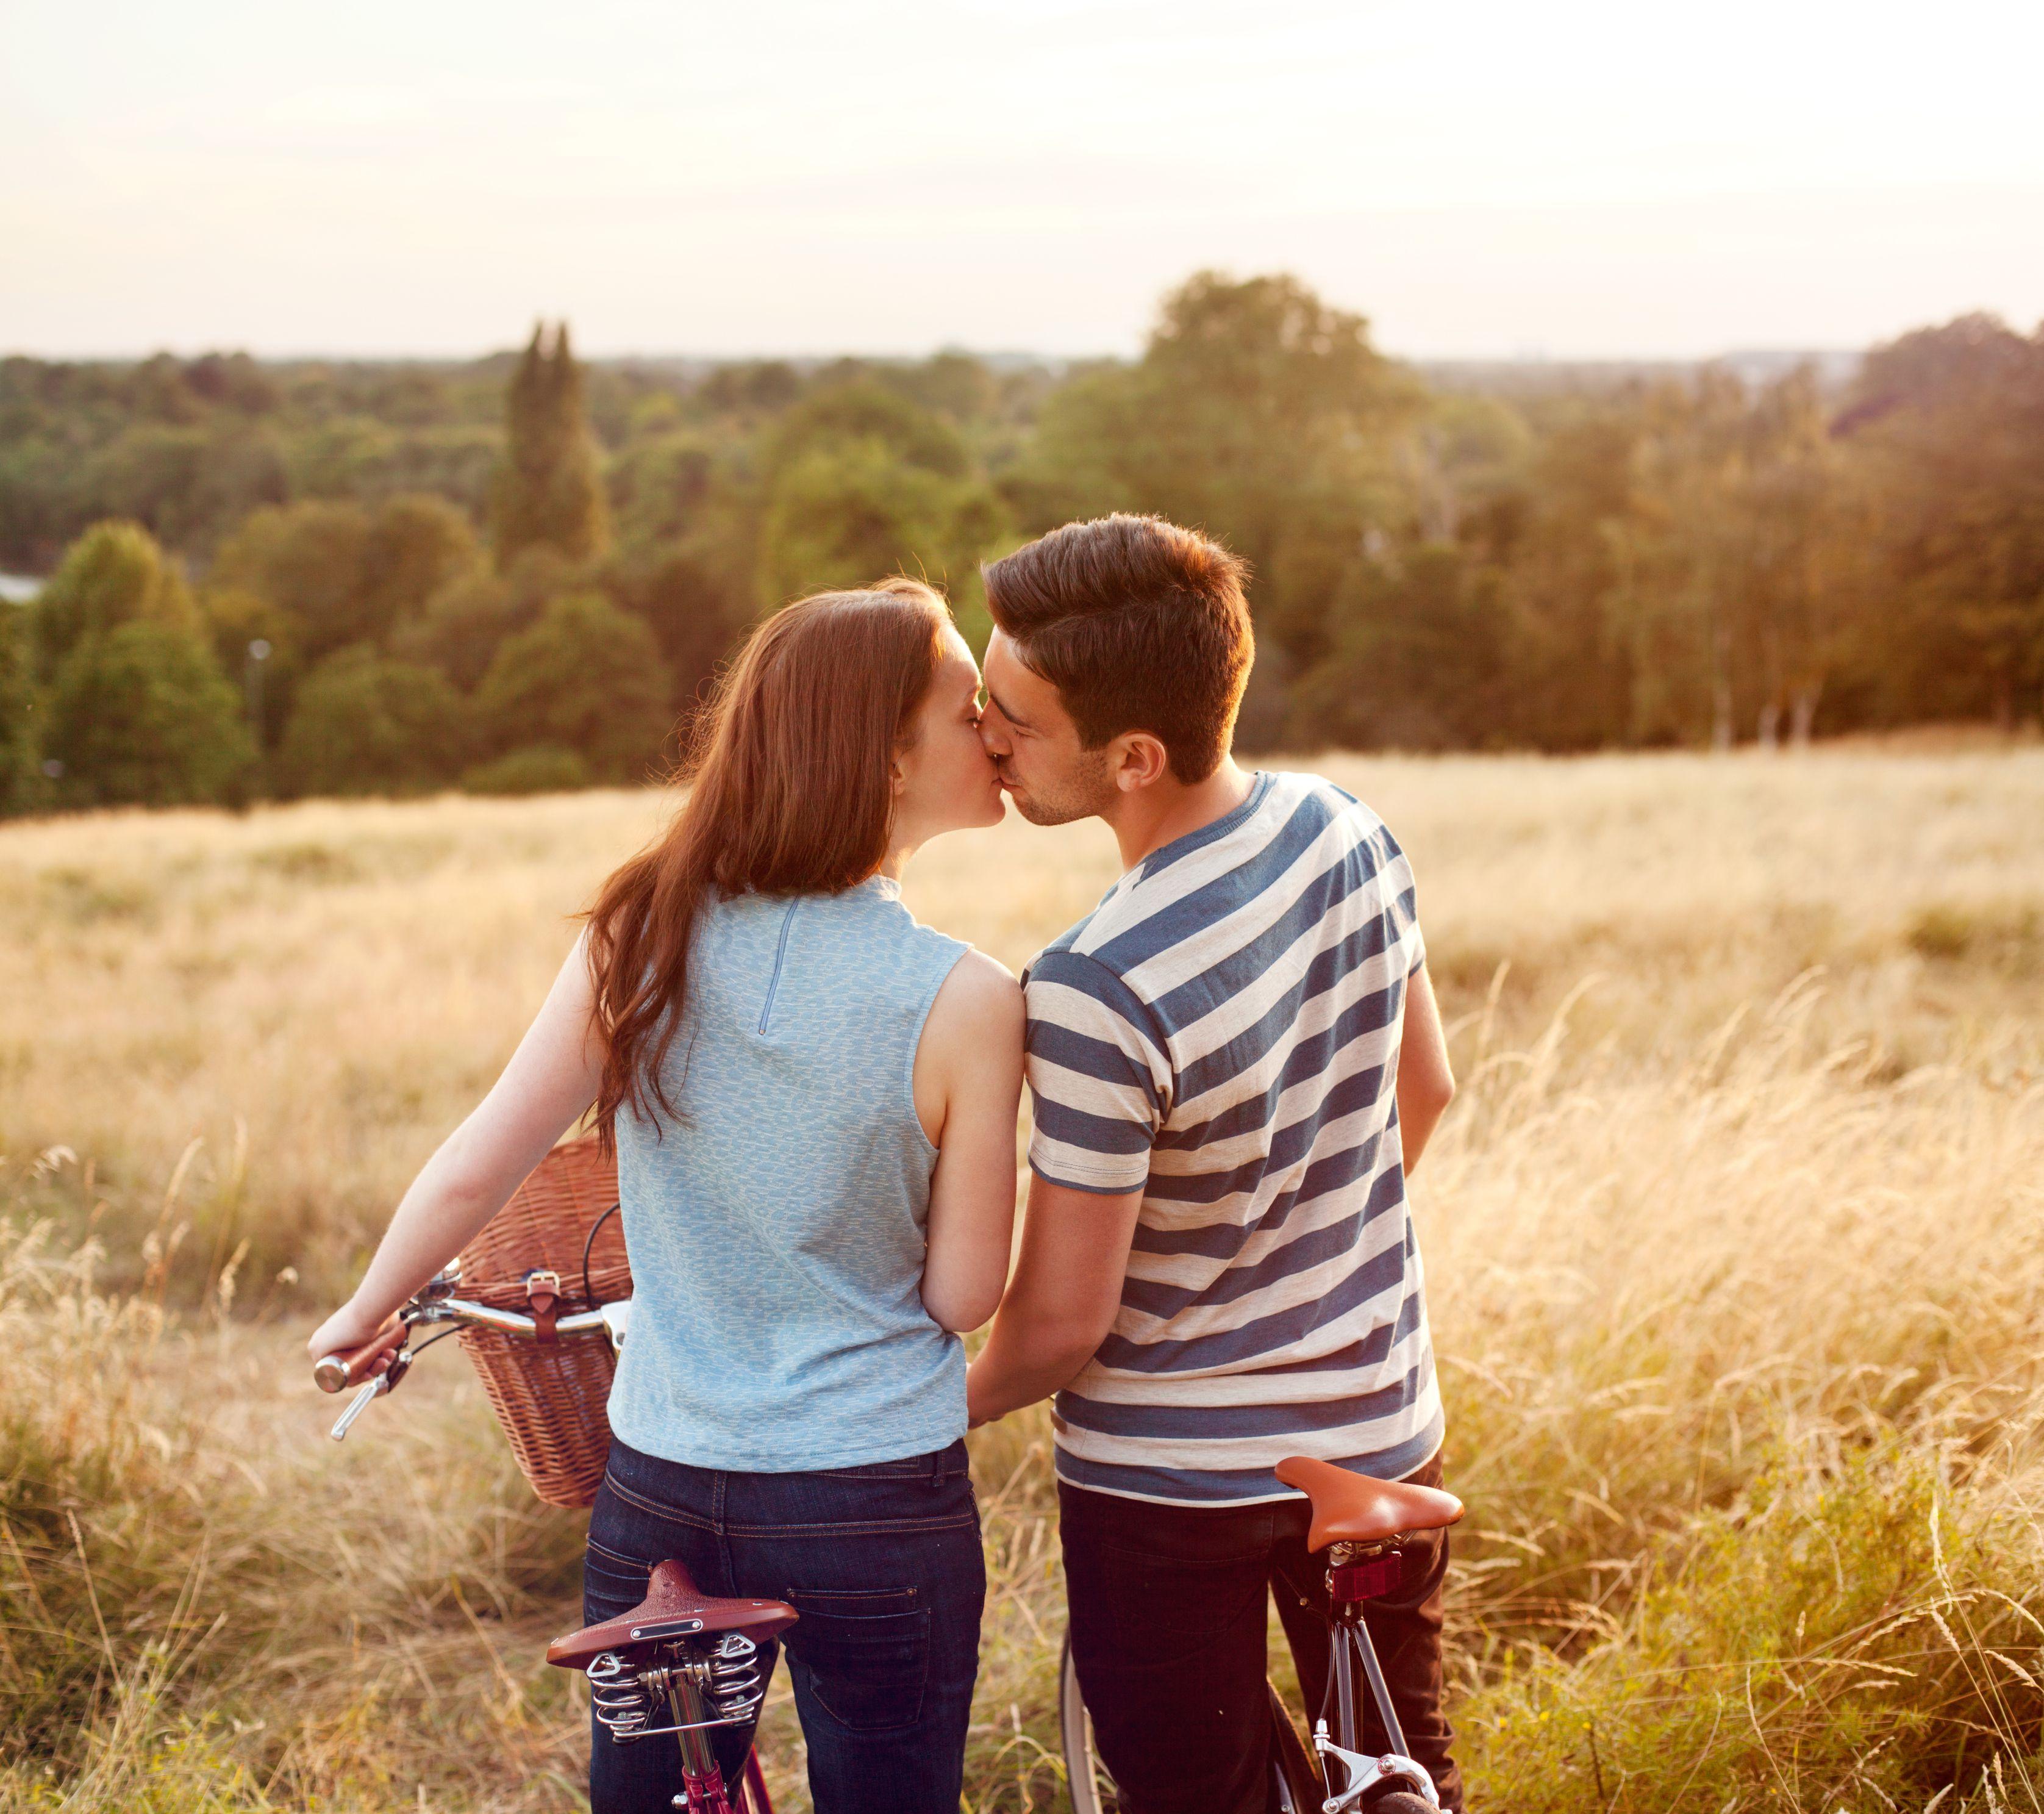 Psychosocial Stage 6 Intimacy Vs Isolation